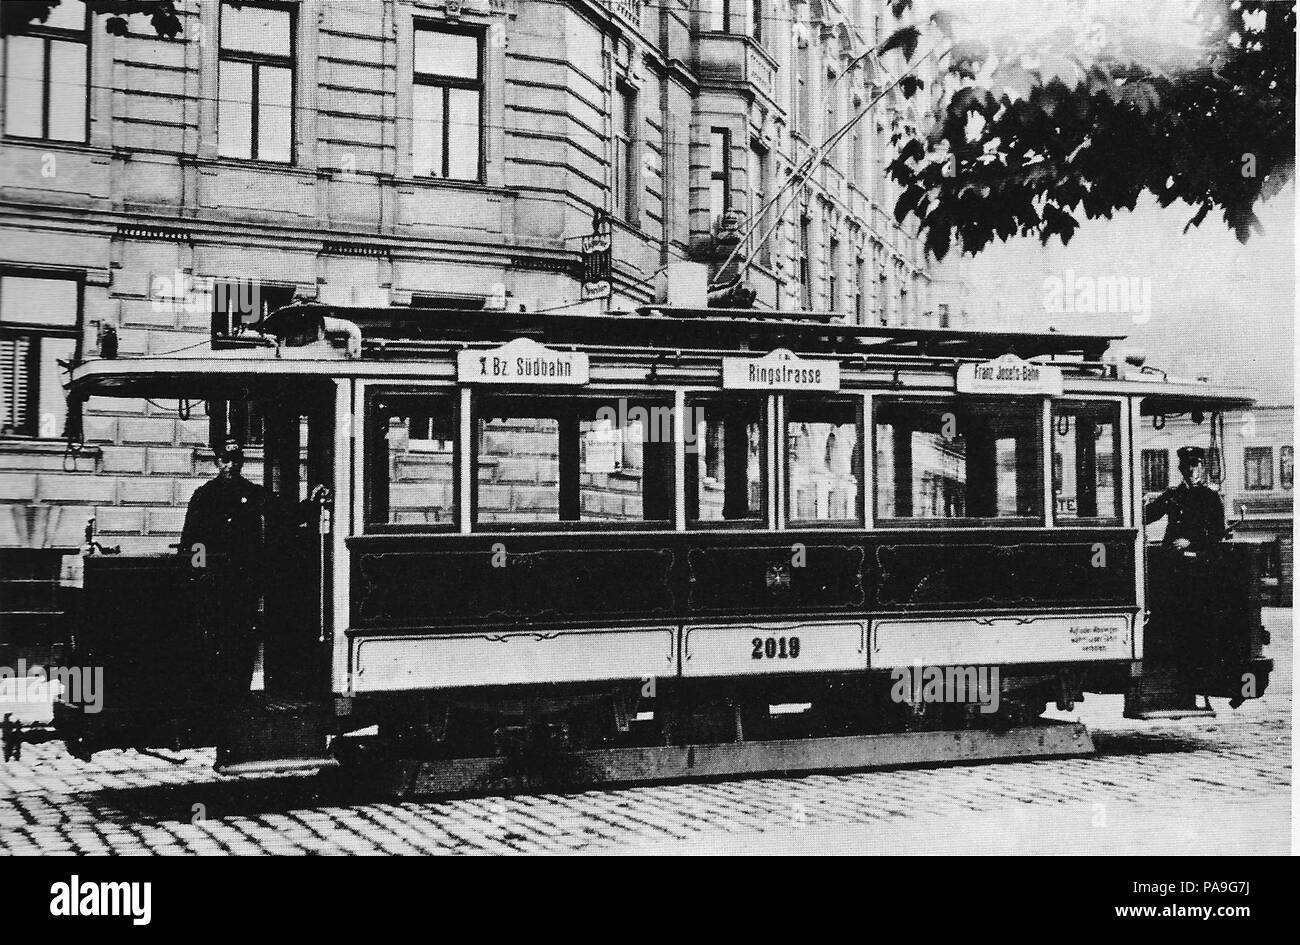 224 S 15, v 1906, G1 2019 - Stock Image